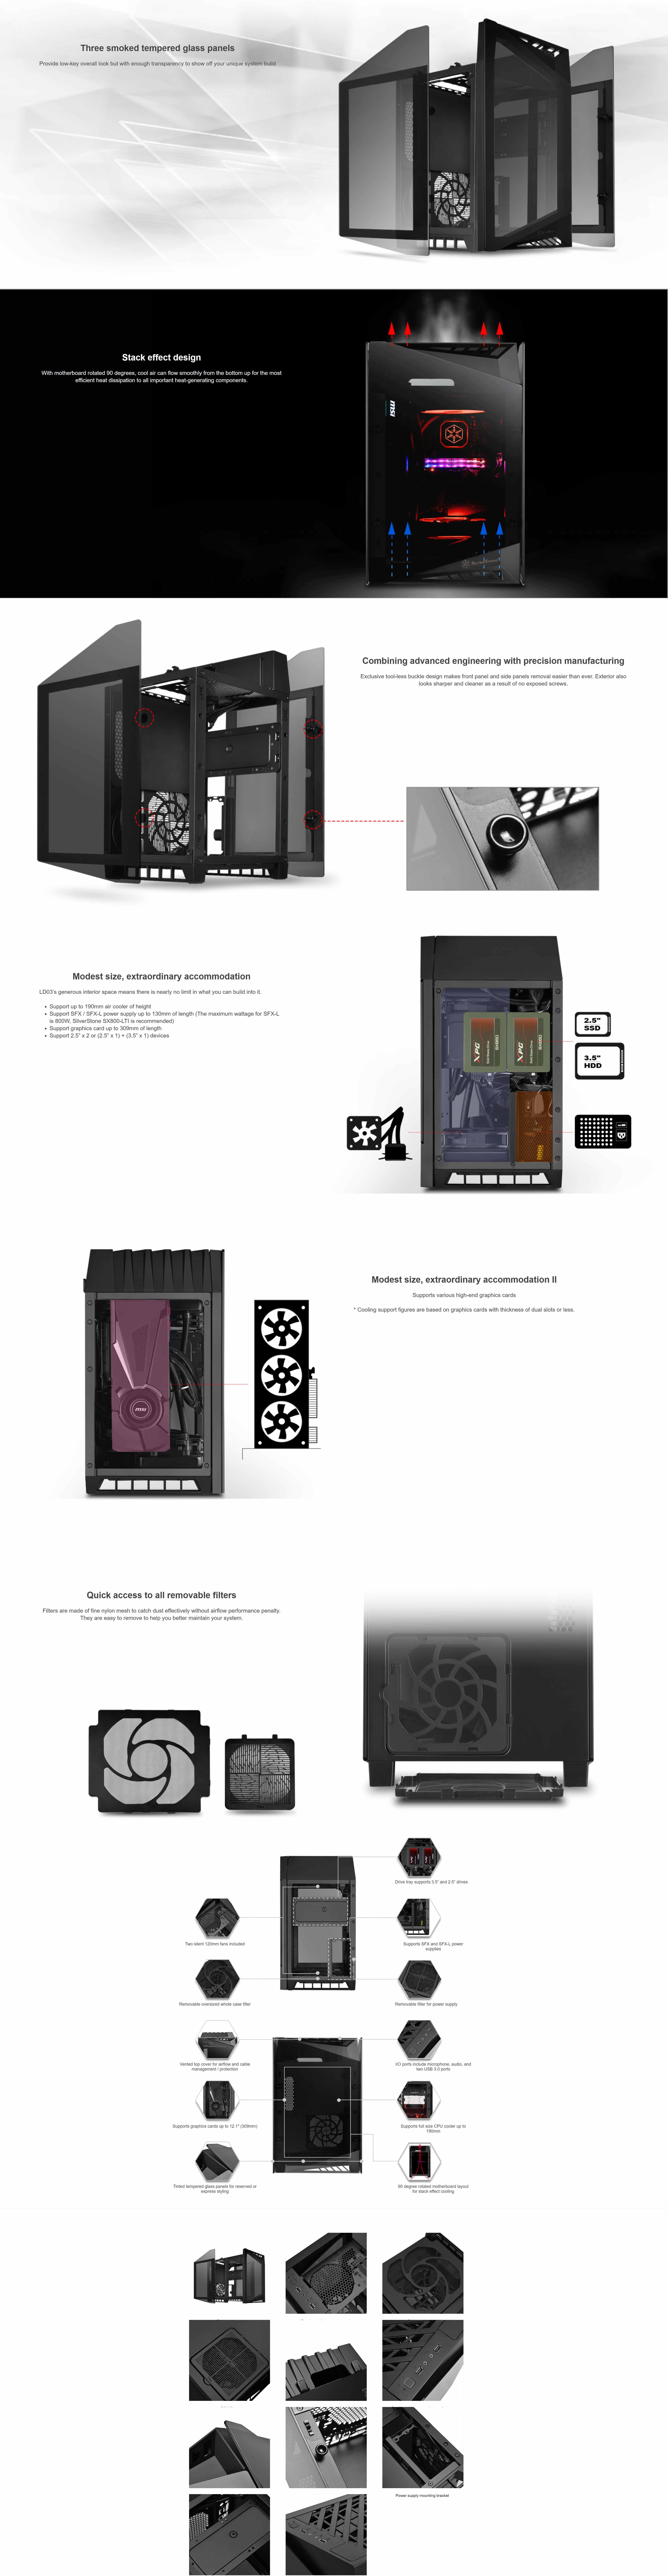 screencapture-silverstonetek-product-php-2020-06-17-15_39_11.jpg